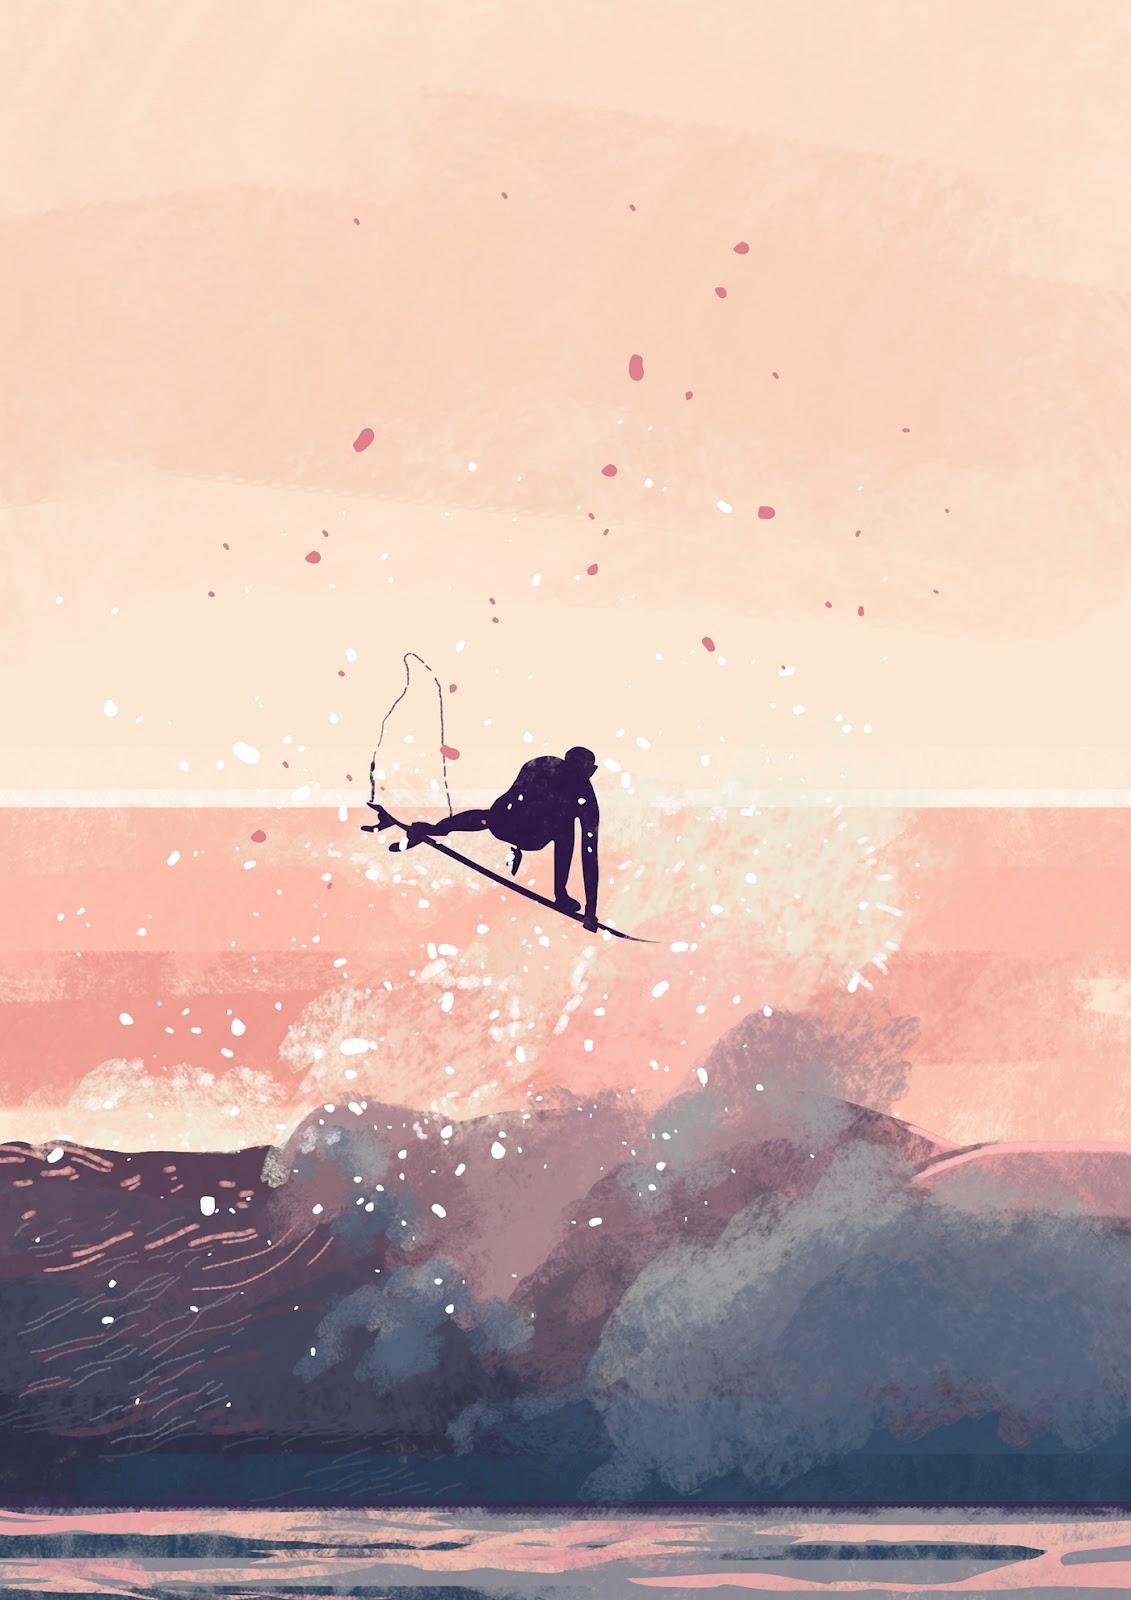 art ArtDirection creative digitalart digtalpainting graphic ILLUSTRATION  Ocean photoshop Surf